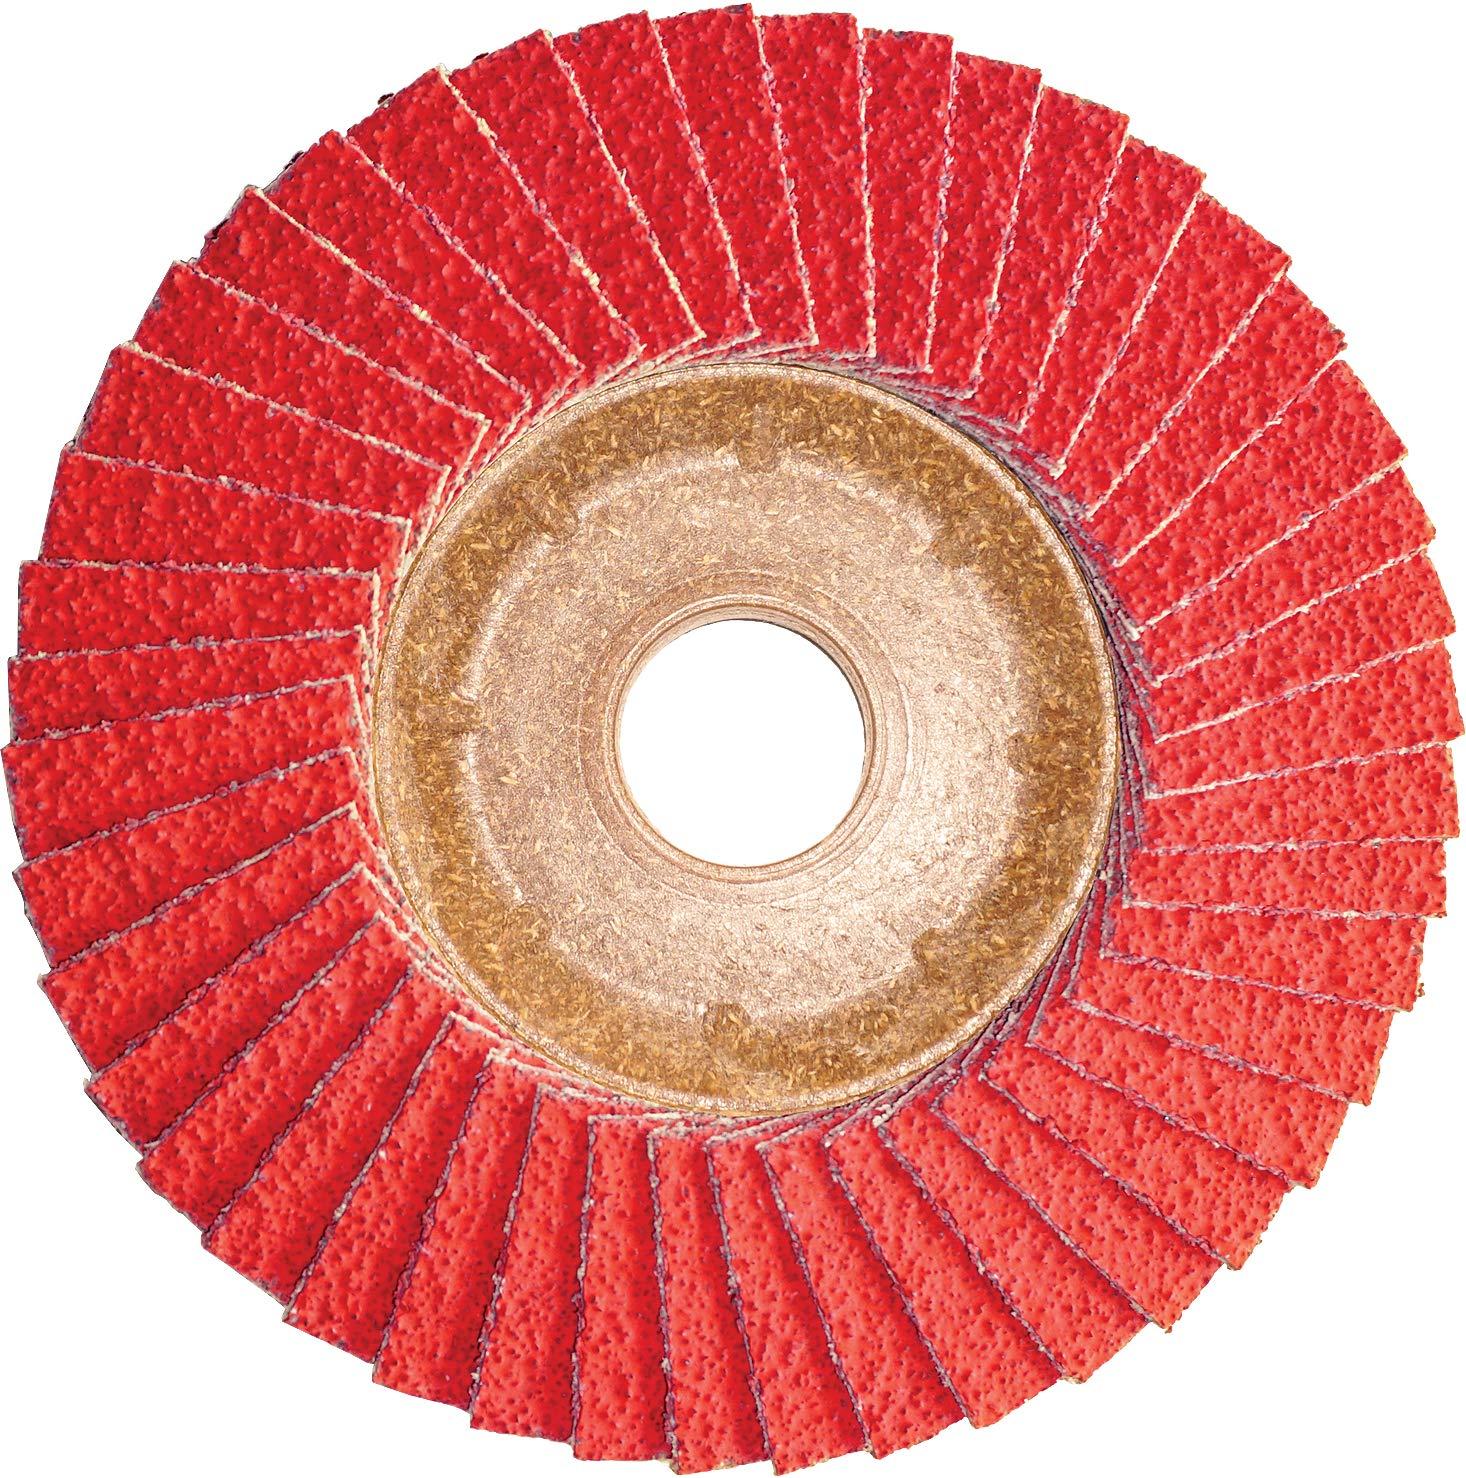 CS Unitec 93551 PLANTEX Ceramic High Performance Flap Disc for Hard to Grind Metals, 4-1/2'' Diameter, 7/8'' Arbor, 60 Grit (Pack of 30)